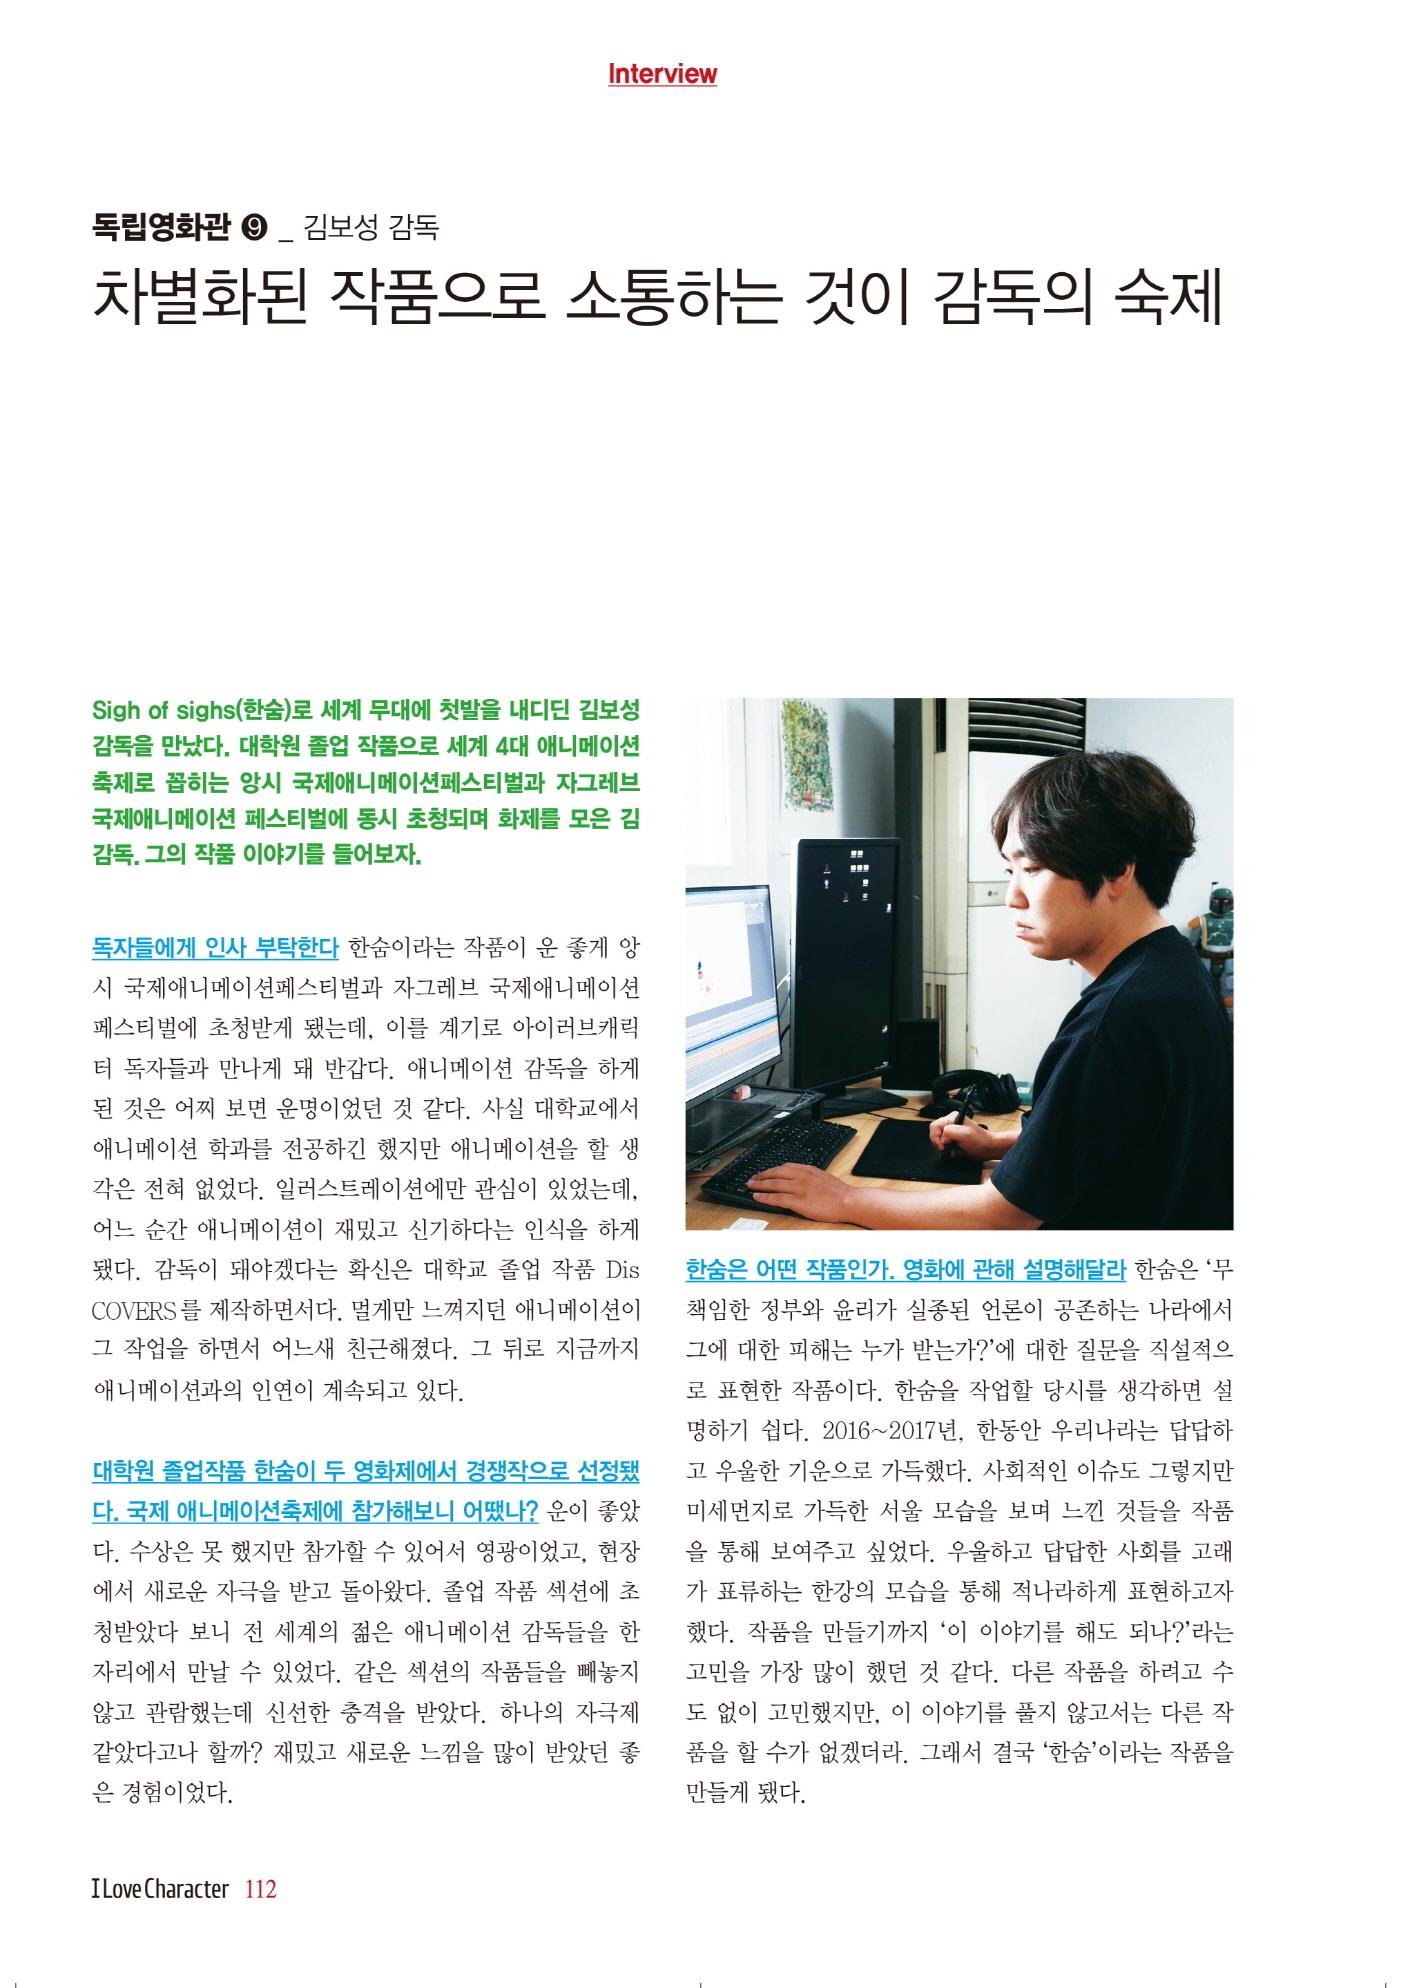 ILC_GIM _Boseong01